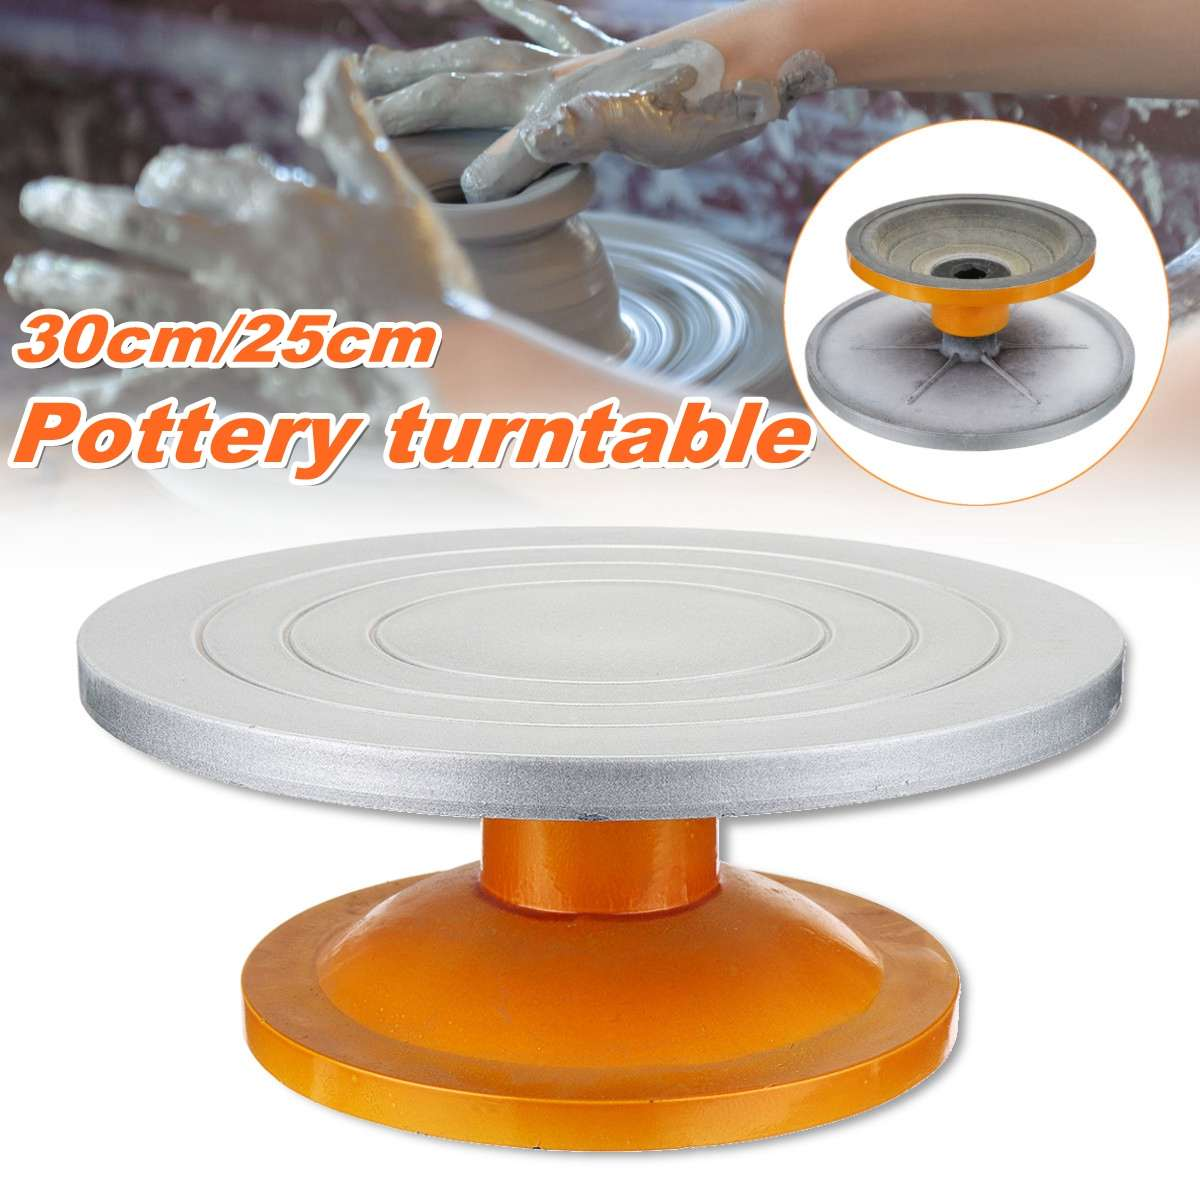 25/30CM Metal Pottery Banding Wheel Turntable Turnplate Clay Sculpture Modelling25/30CM Metal Pottery Banding Wheel Turntable Turnplate Clay Sculpture Modelling